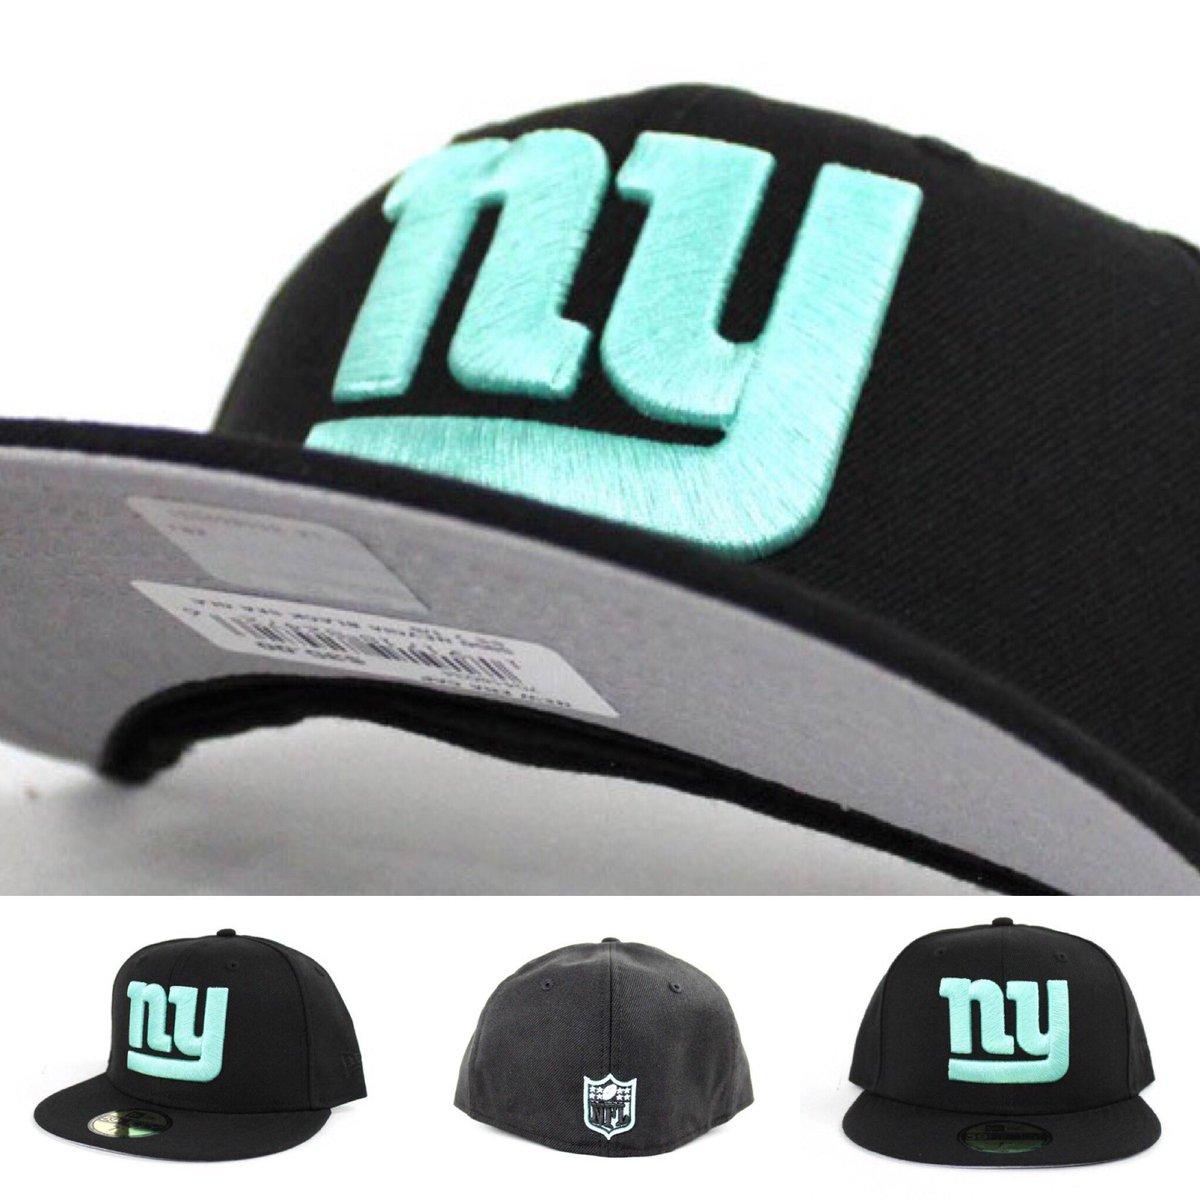 deea44339775a ... http   www.ecapcity.com new-york-giants-new-era-59fifty-fitted-hat-nike-air-foamposite-pro-island-green-2017-aqua-black-gray-under-brim.html  …